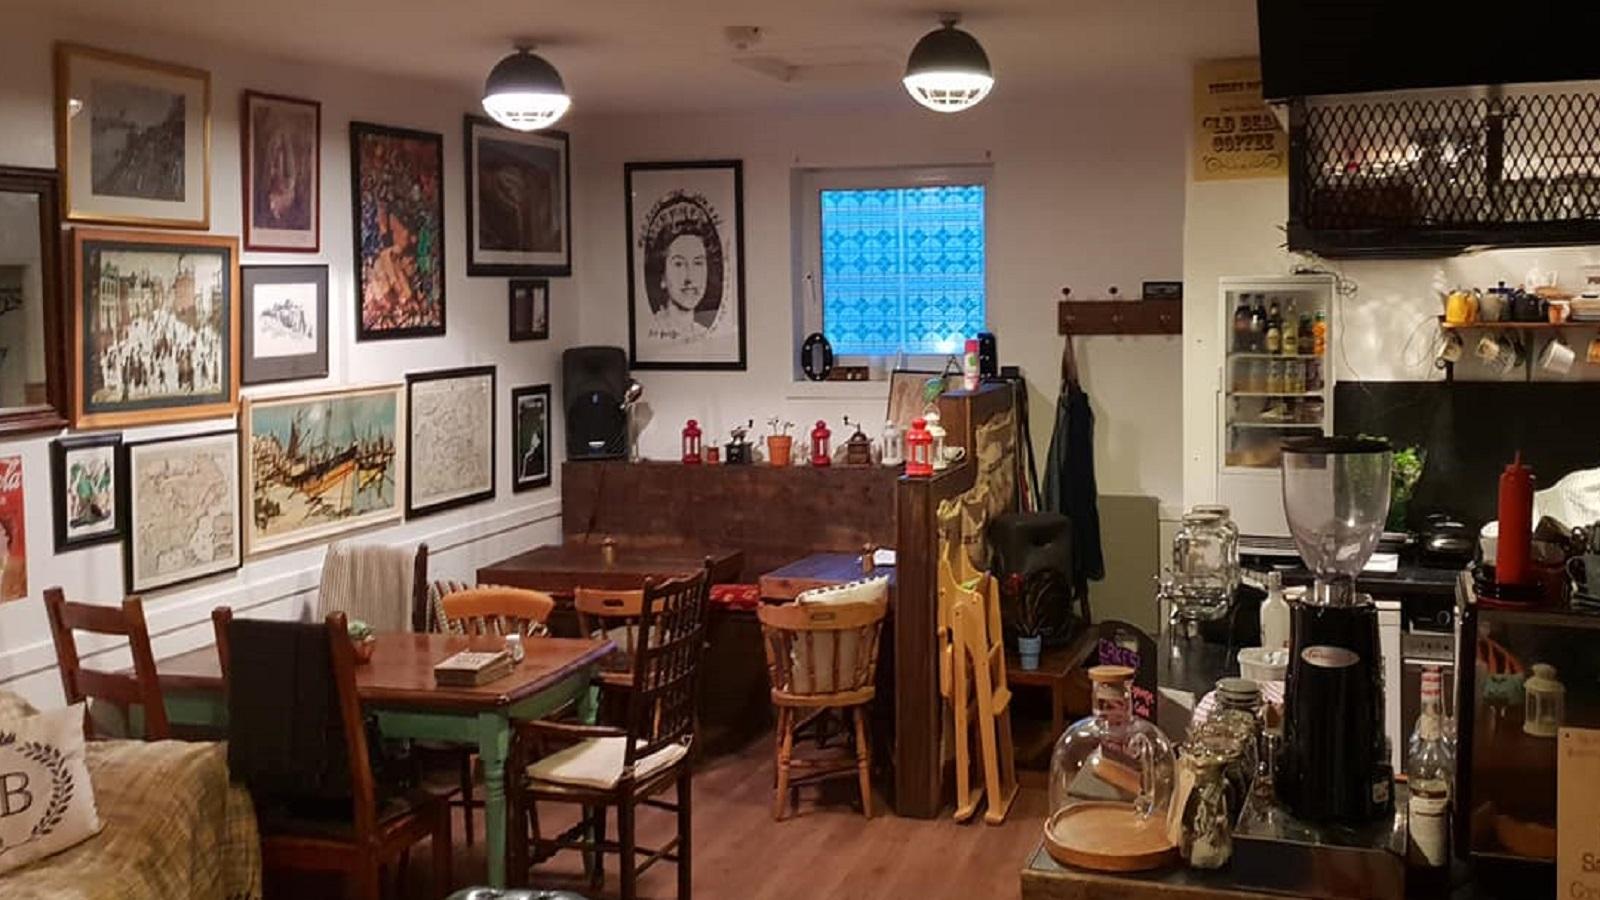 Auld Bean Coffee House